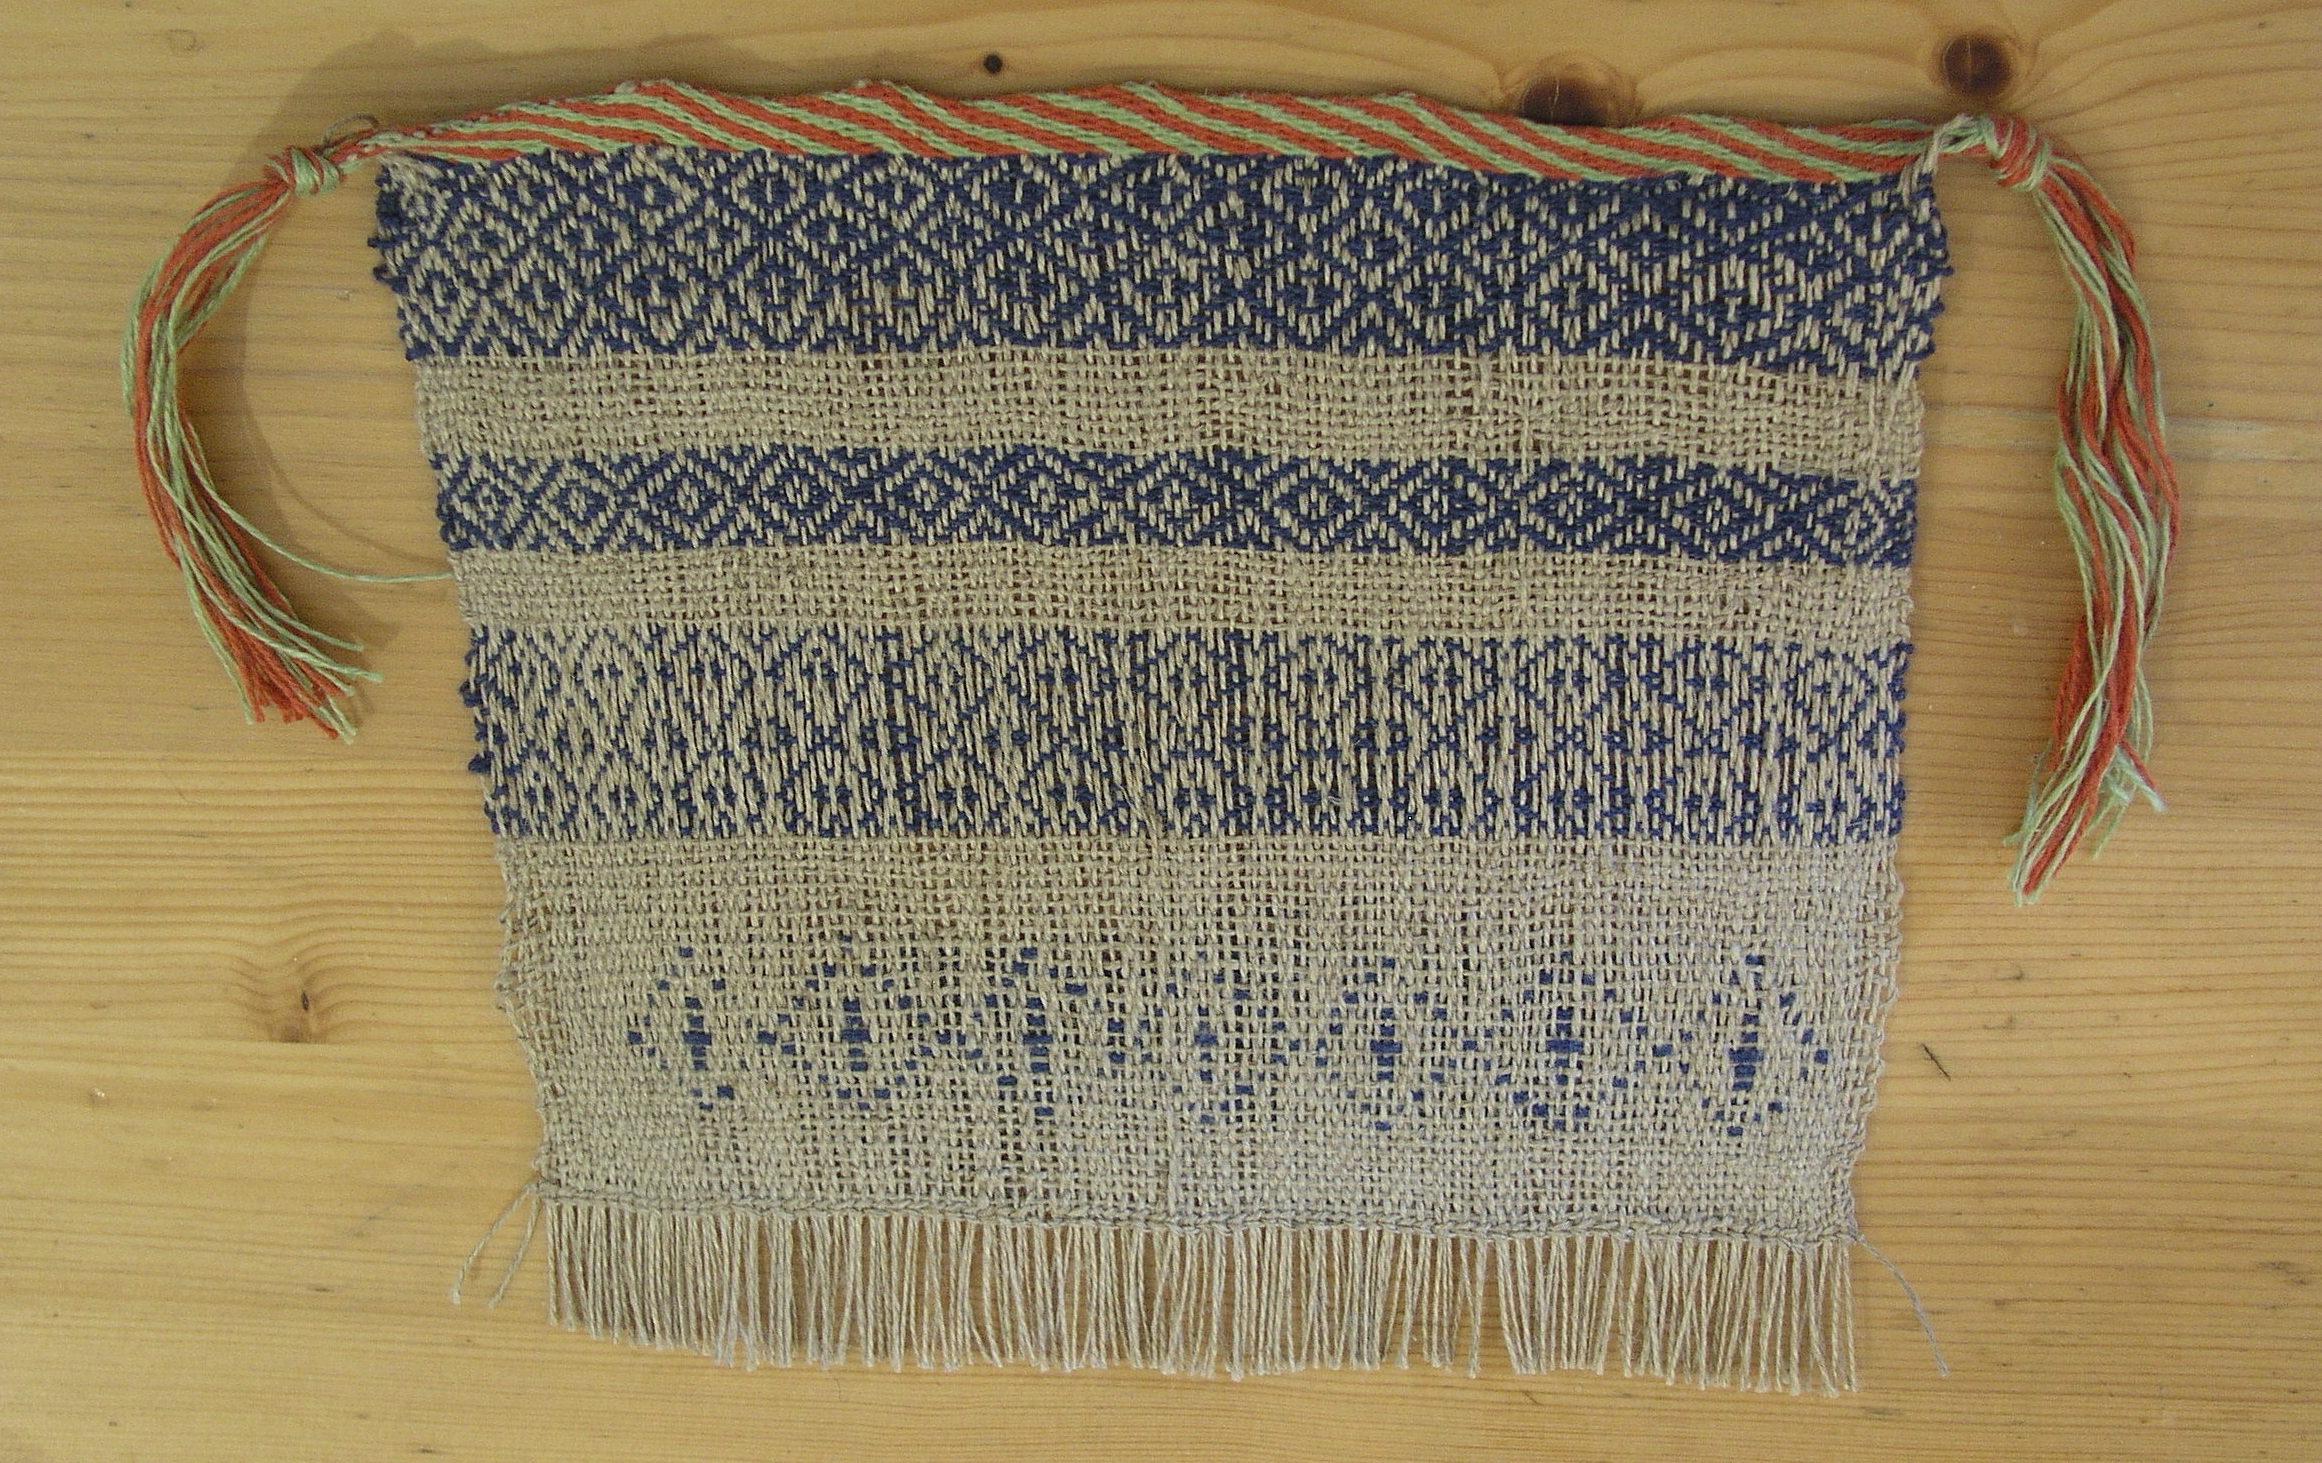 Reconstruction of lozenge patterns on the warp-weighted loom. Photo S. Spantidaki.